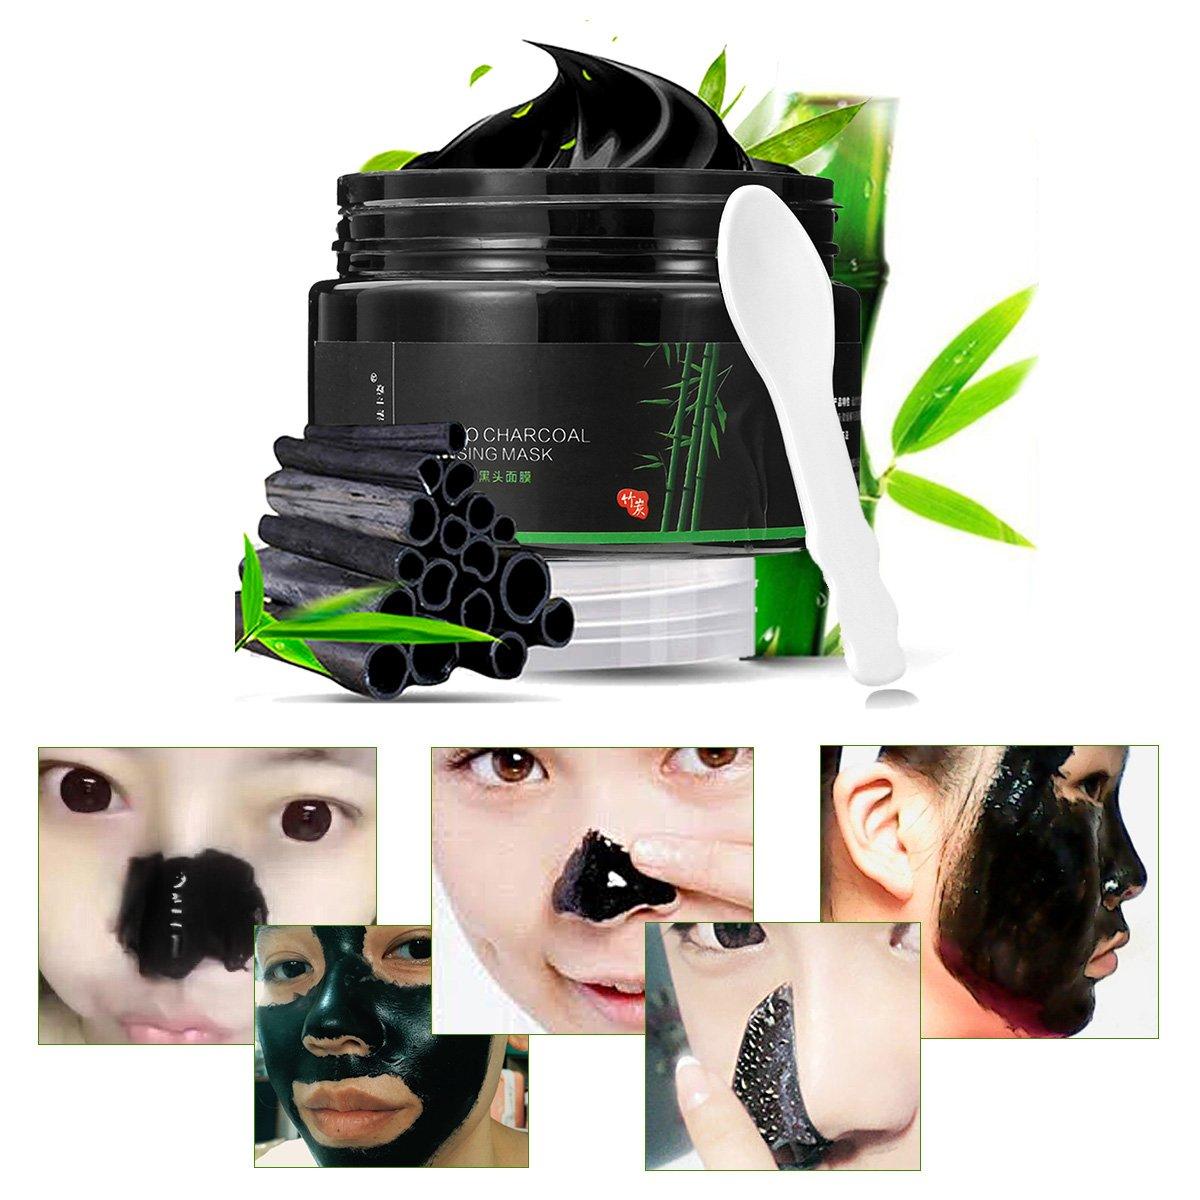 Facciale Cura, LuckyFine, Blackhead Mask per Cura Viso Maschera Di Cotone Di Bambù Per Punti Neri Anti Acne Peel off Maschera Nera Pulizia Profonda Rimozione Di Comedone